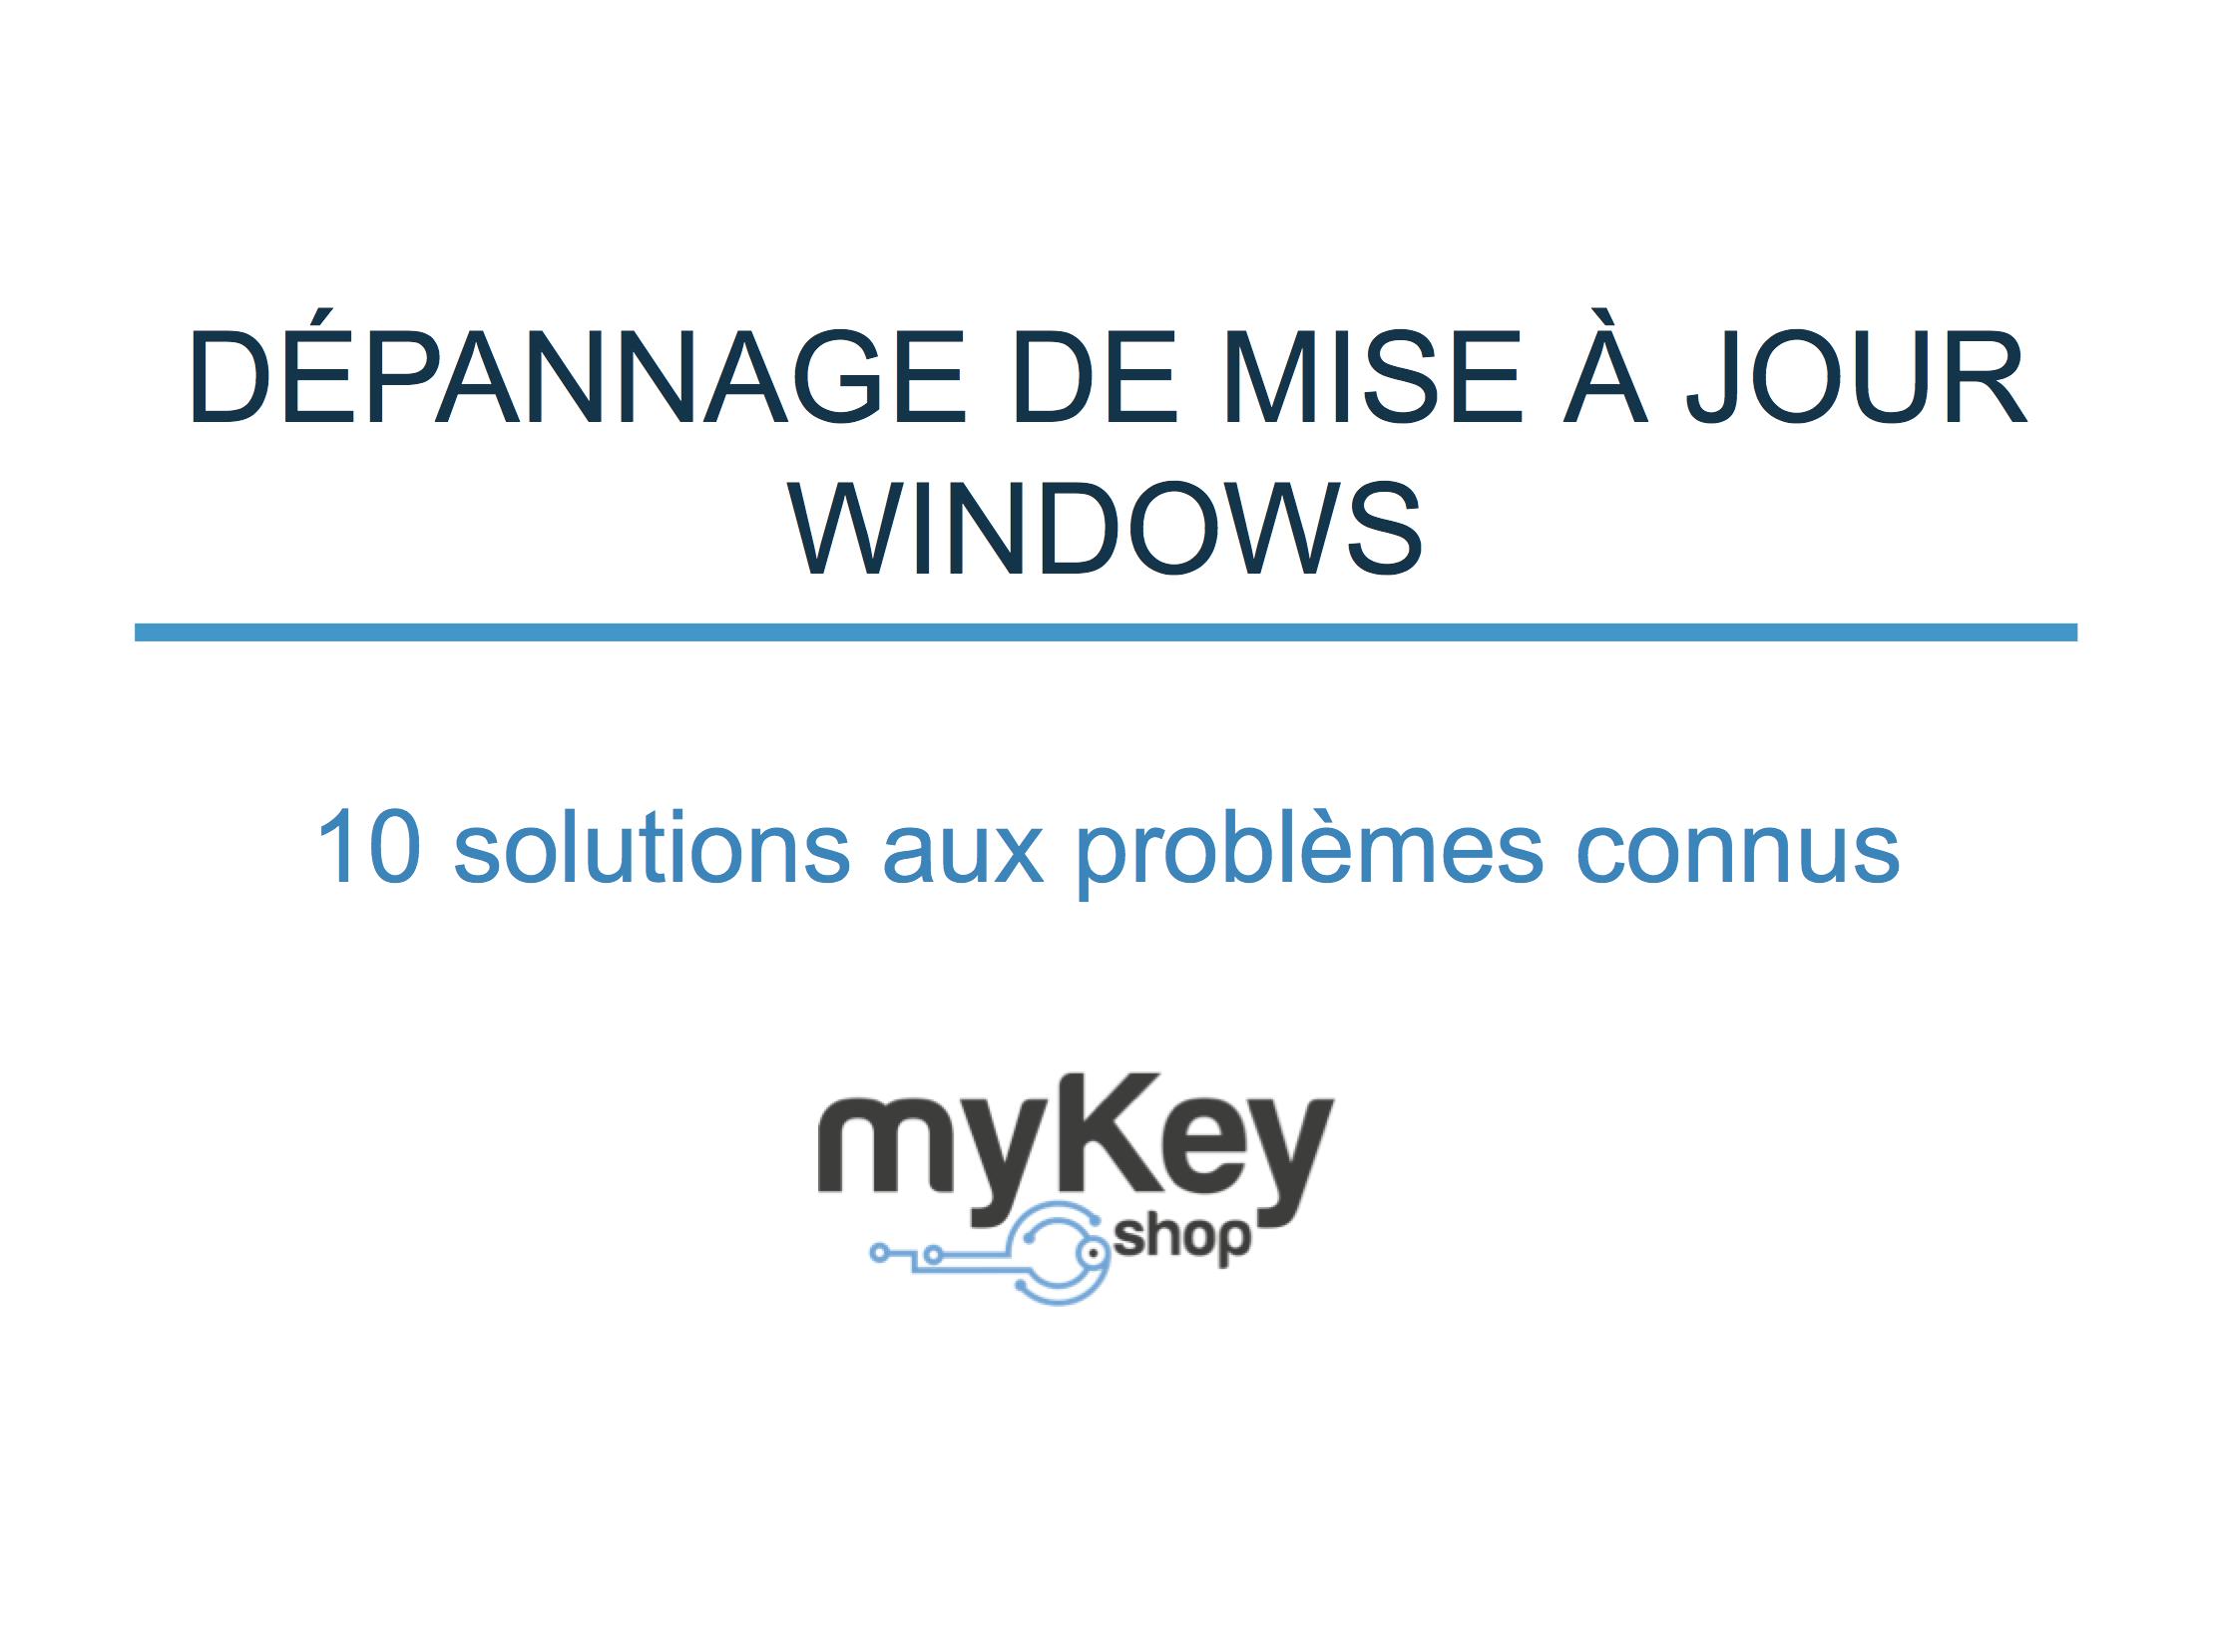 Depannage Windows